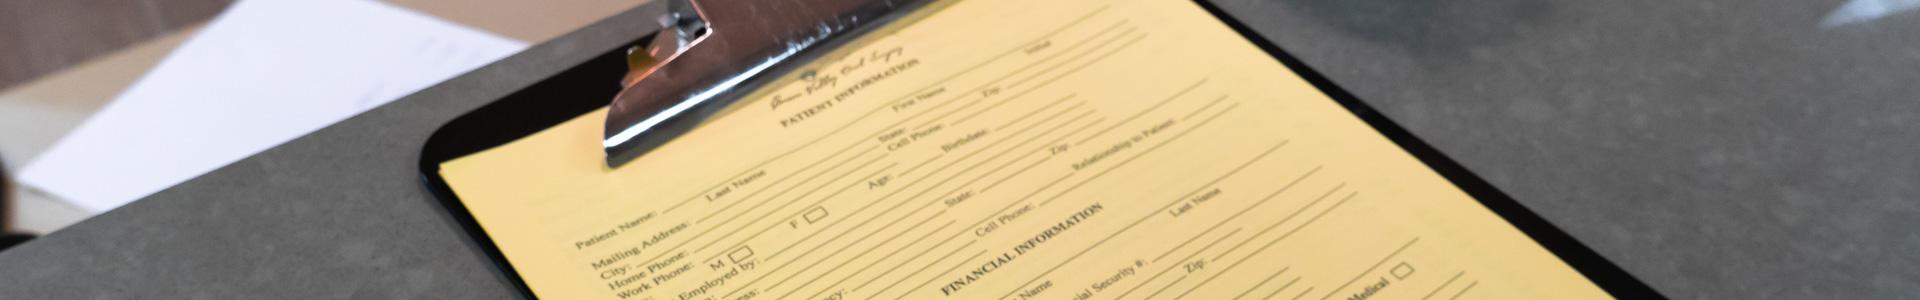 CVOS forms-1